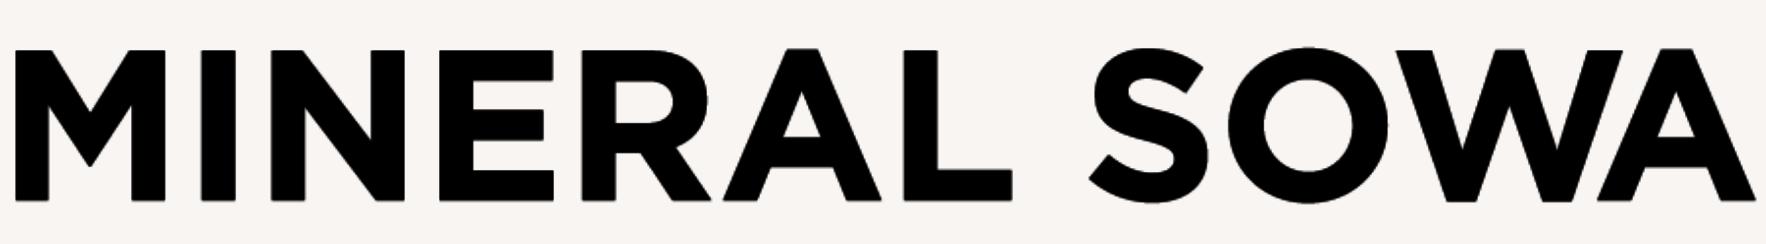 Sponsor logo 20210910132606